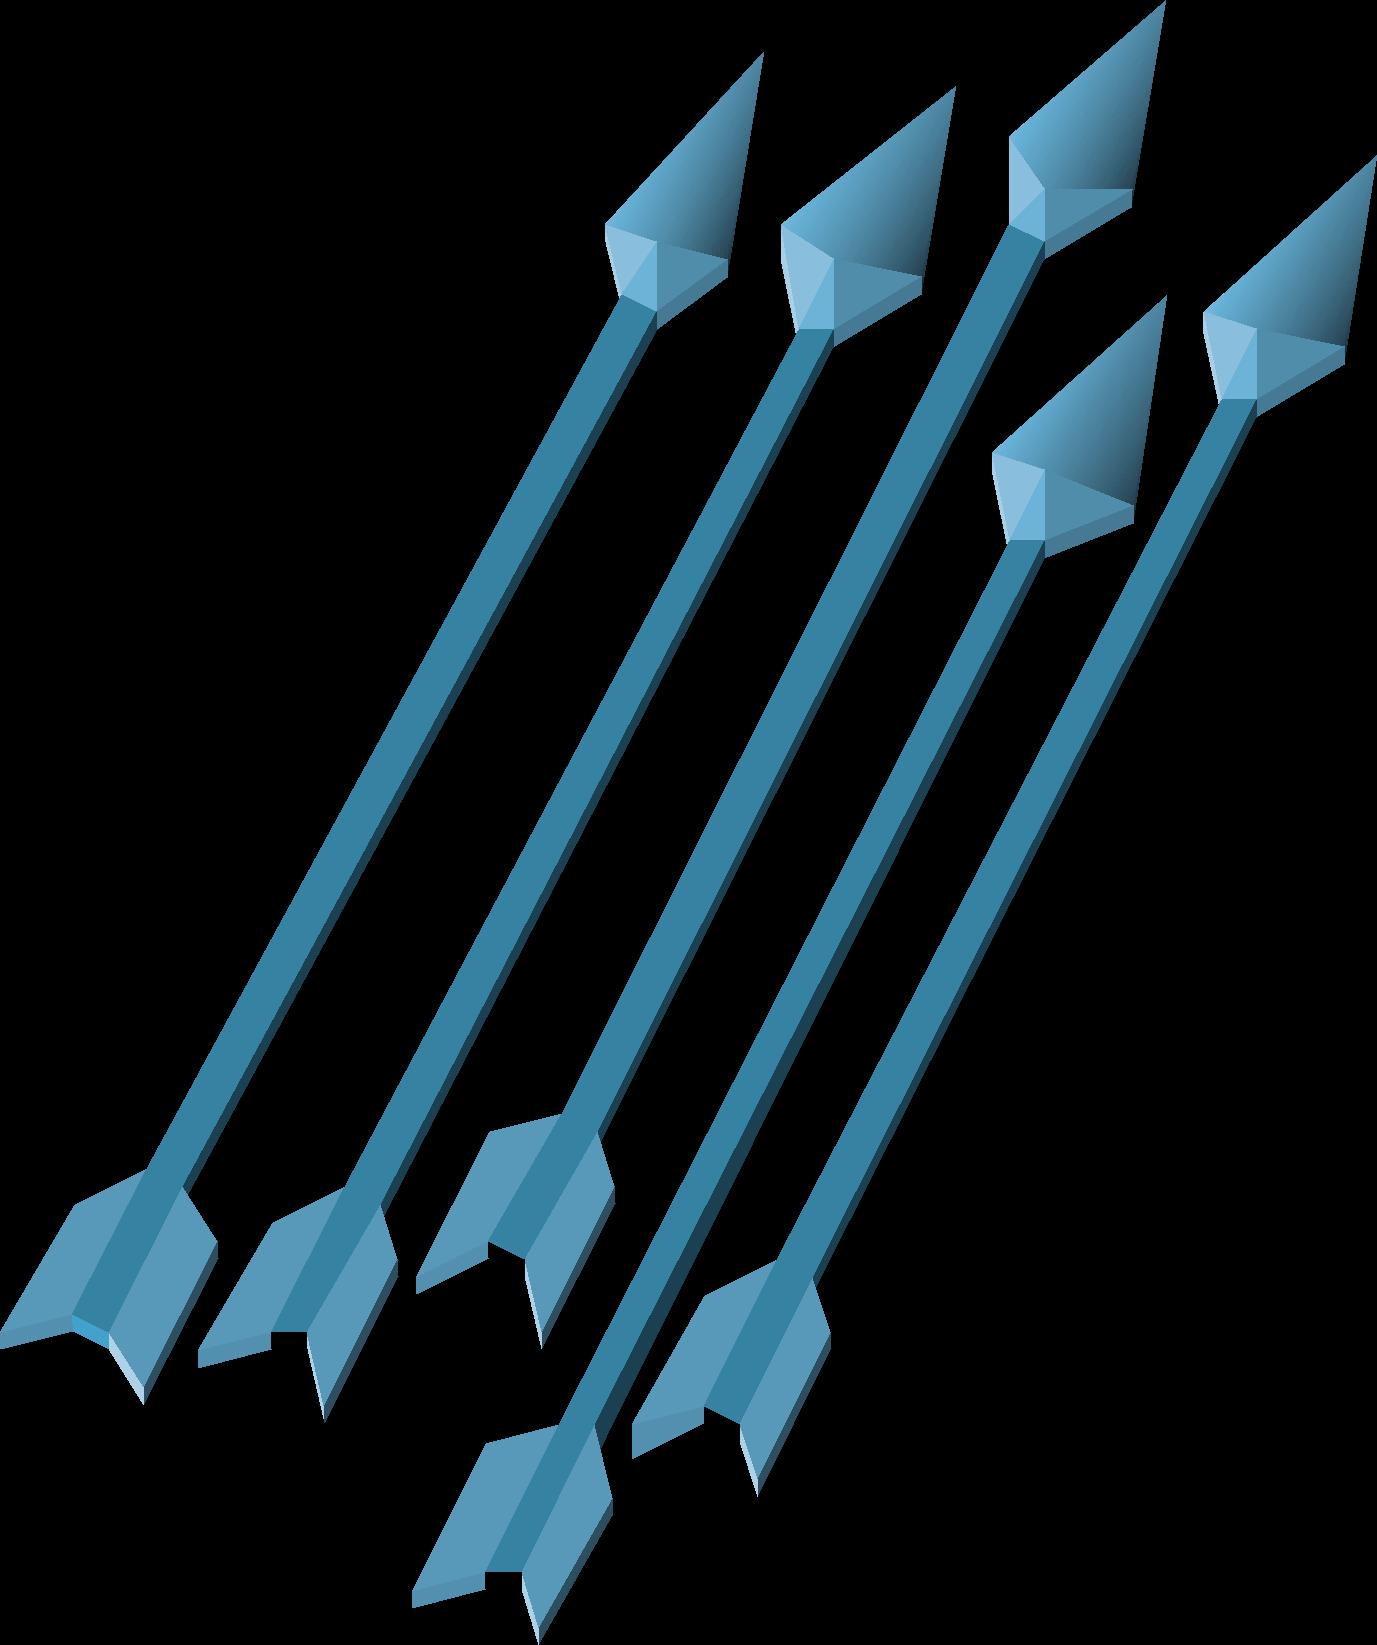 Ice, one of the best arrows in Old School RuneScape